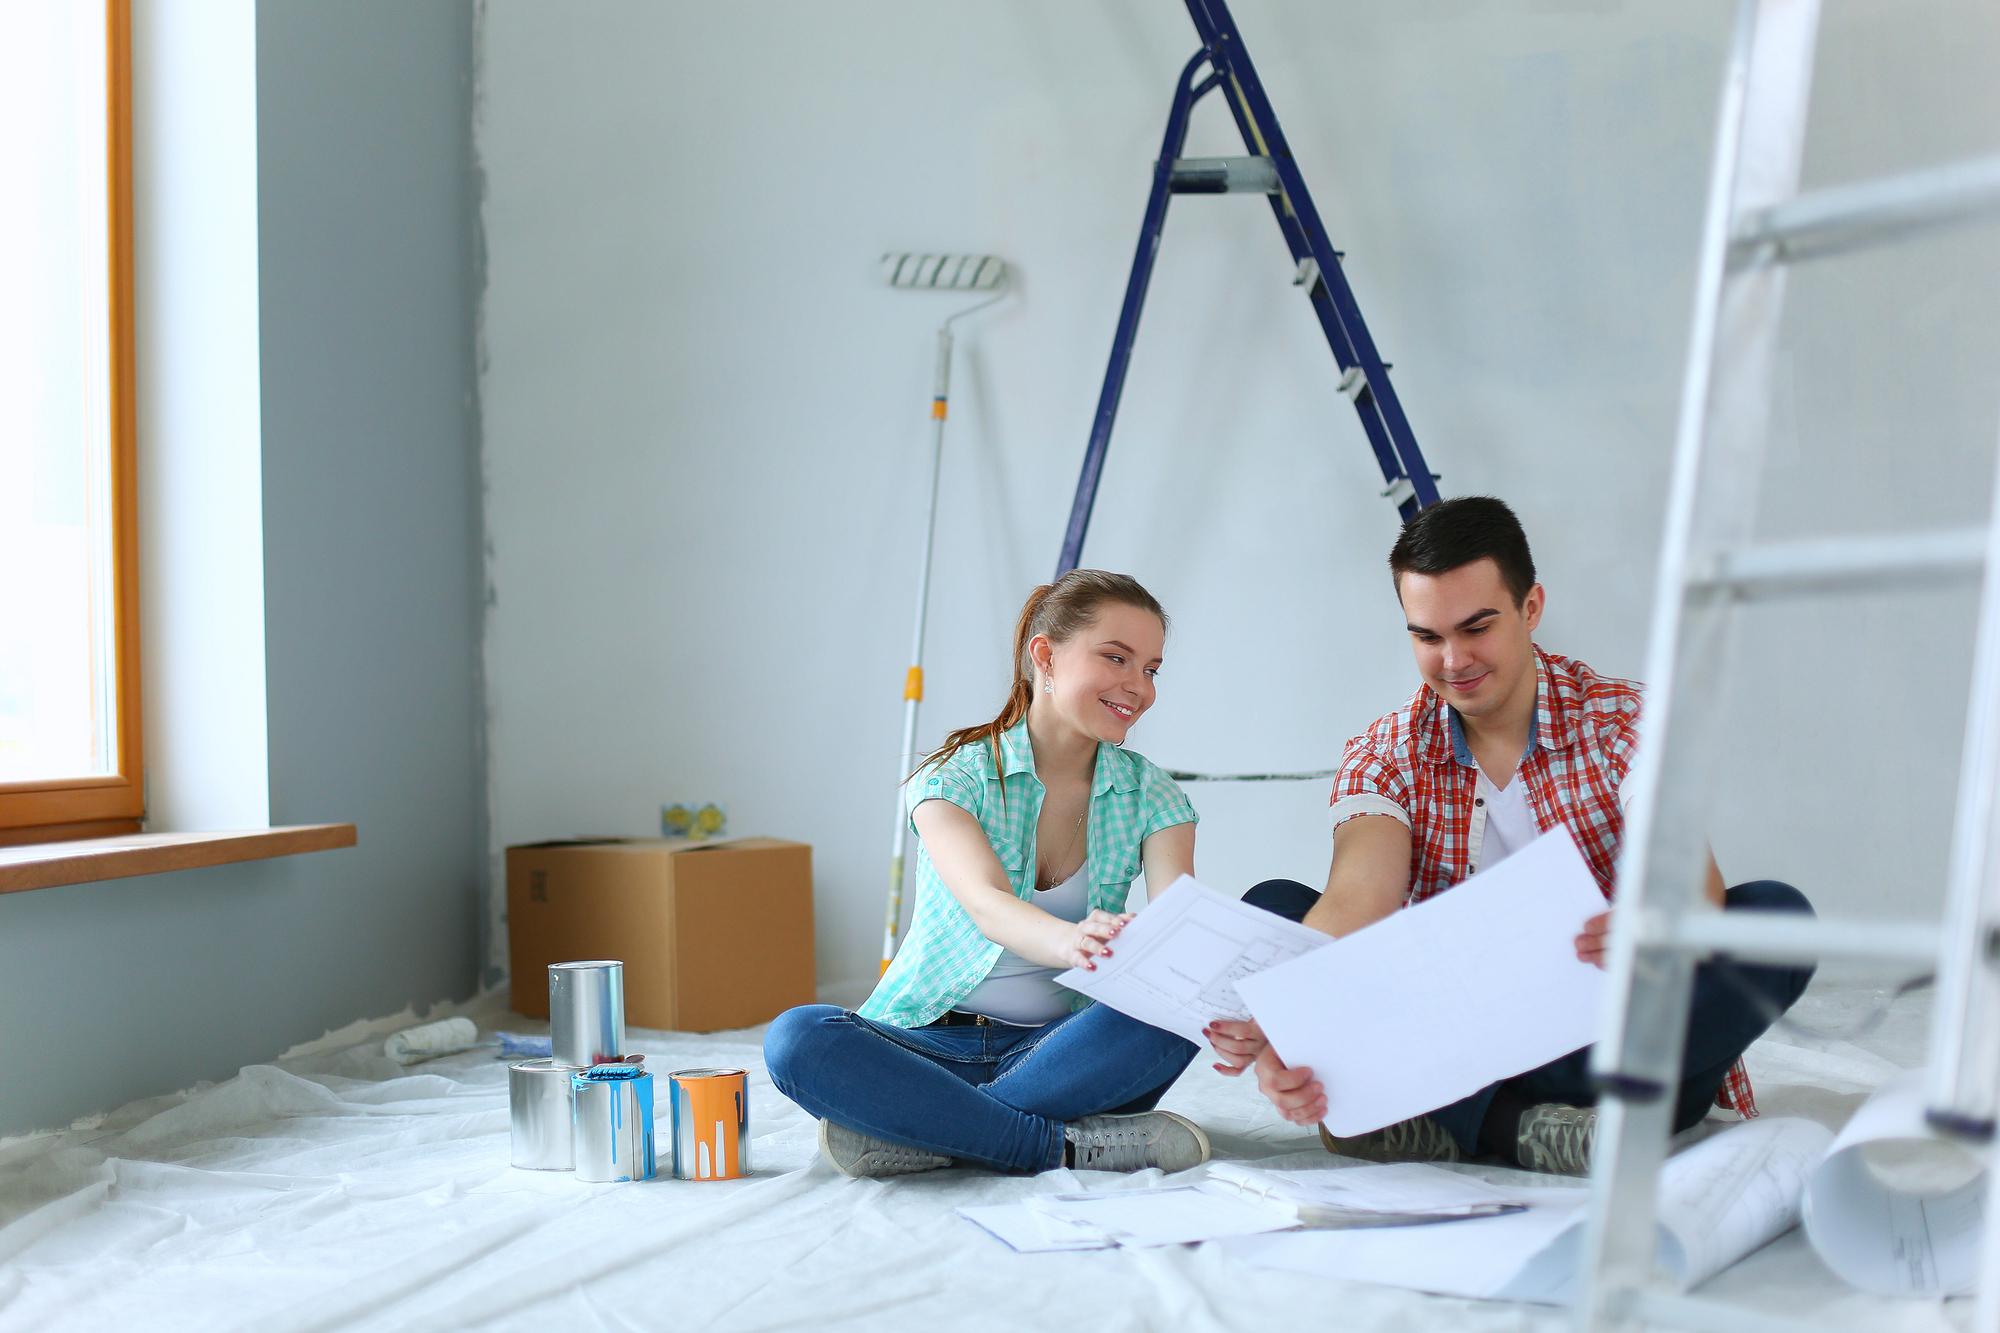 homeowners insurance Alabama